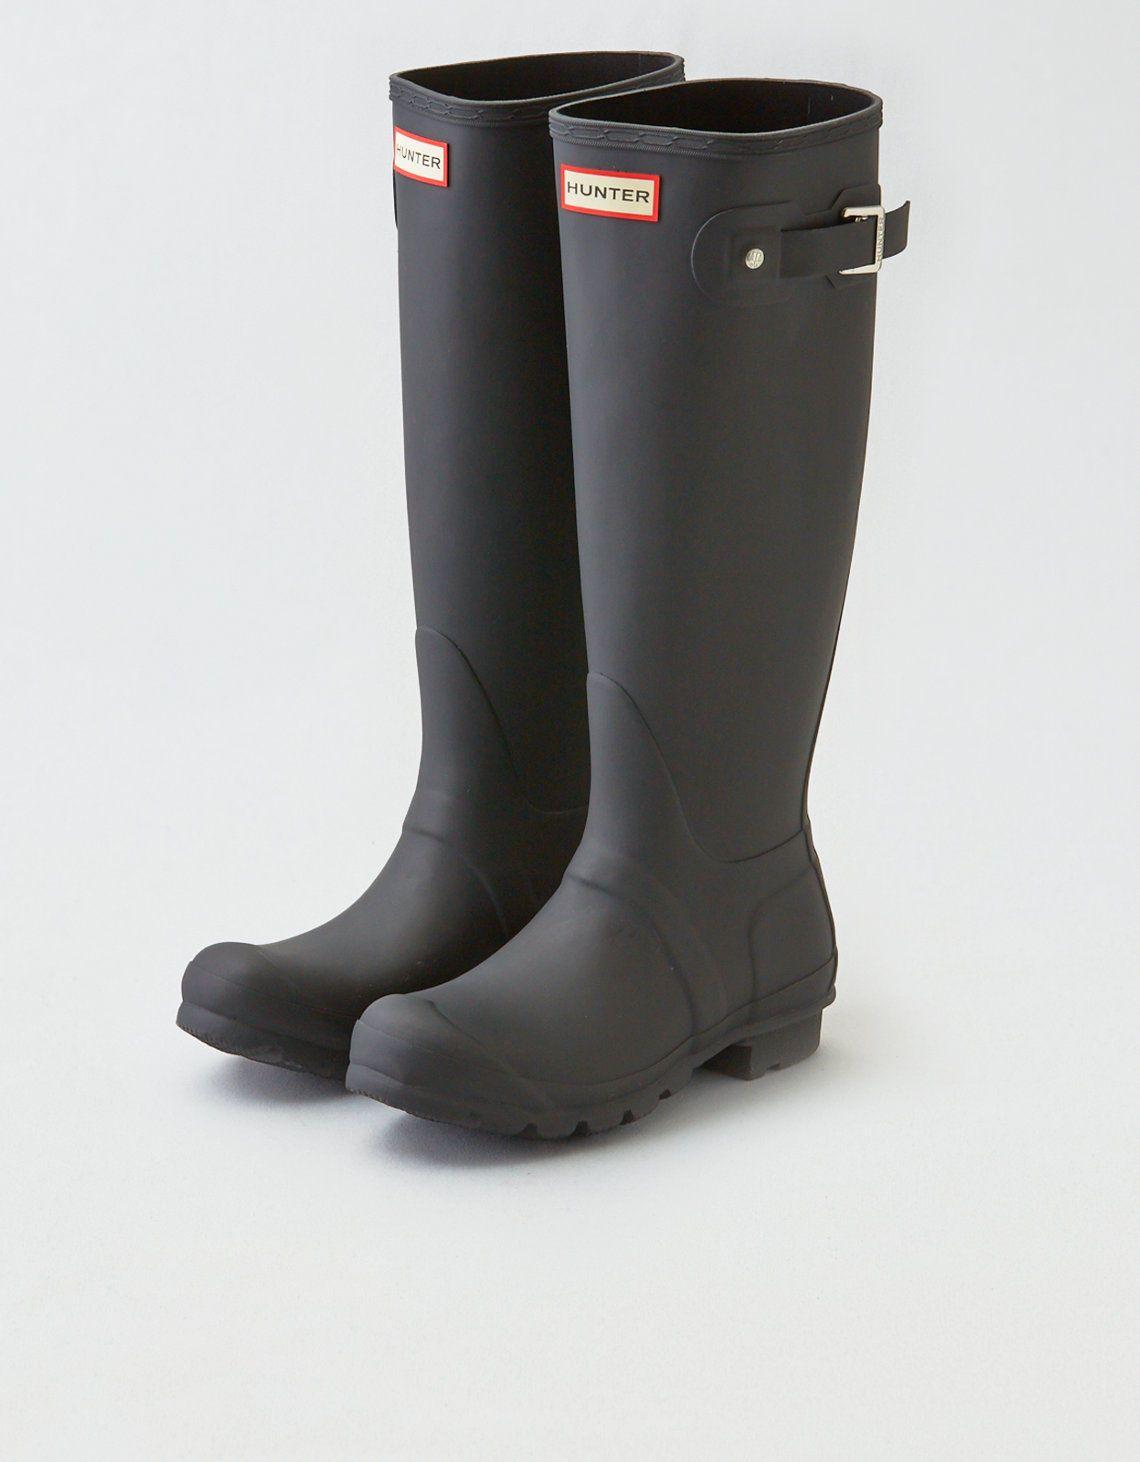 653bc571e276 US  99.00 Hunter Original Tall Rain Boots Black Matte Size 8